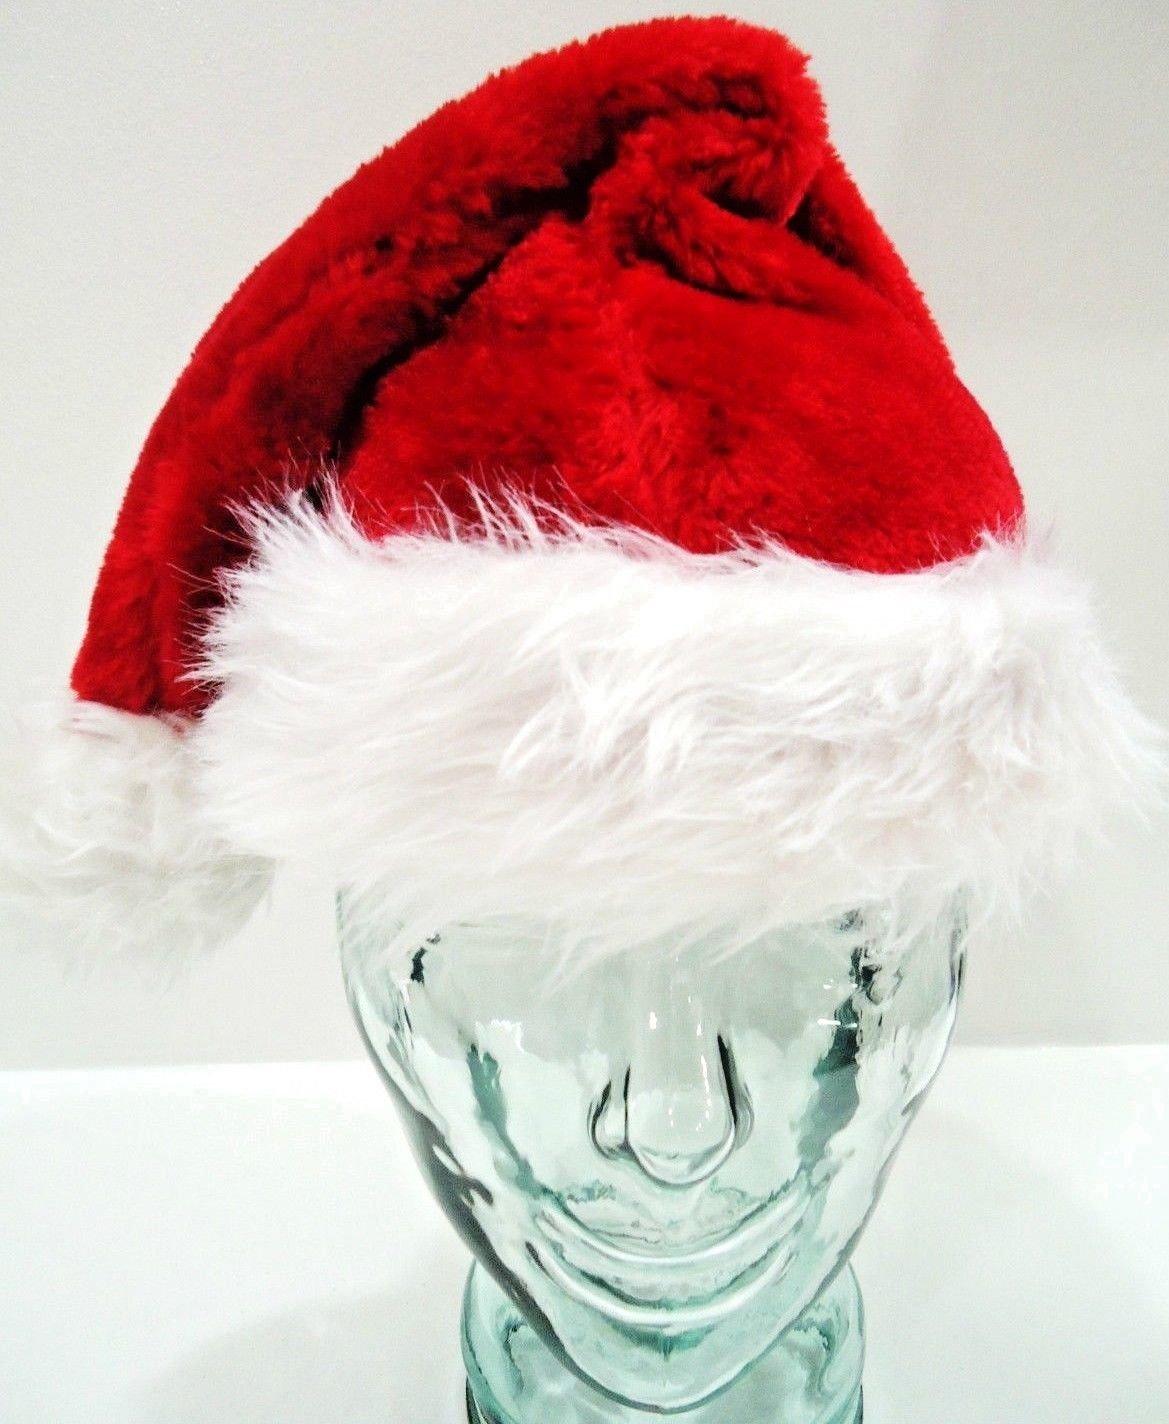 HOME ELEMENTS - UNISEX - CHRISTMAS - SANTA - ELF - RED - WHITE - HAT - CAP - NEW